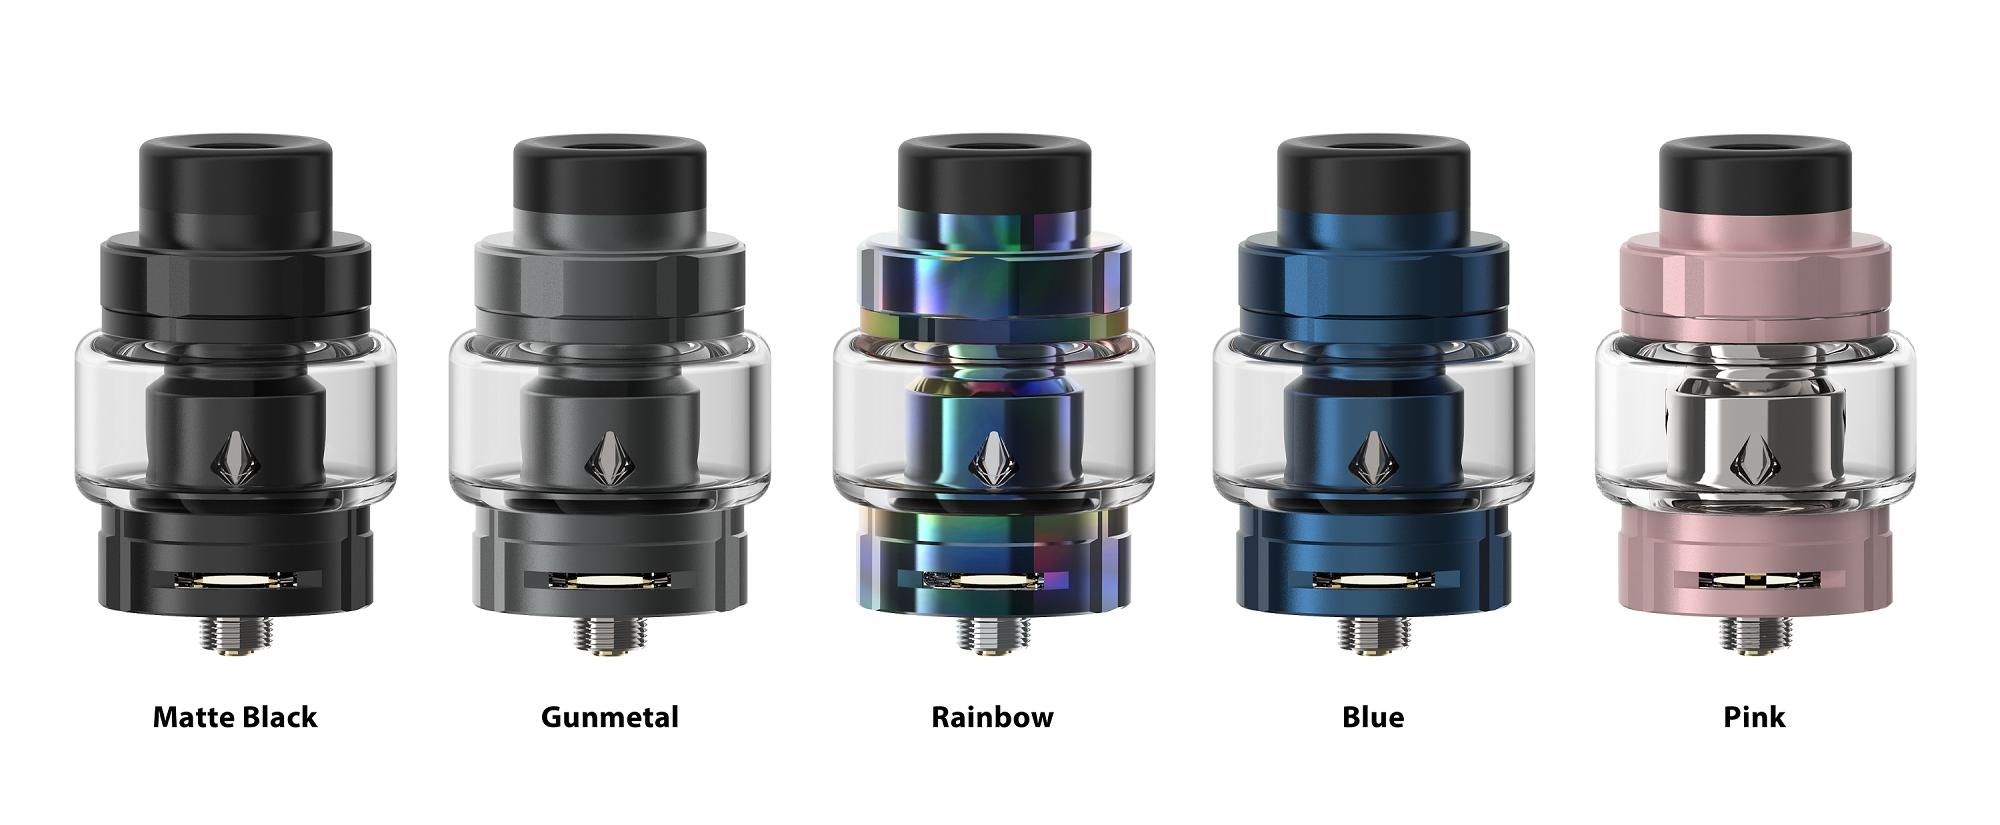 The Aspire Odan EVO Standard version in matte black, gunmetal, rainbow, blue and pink.